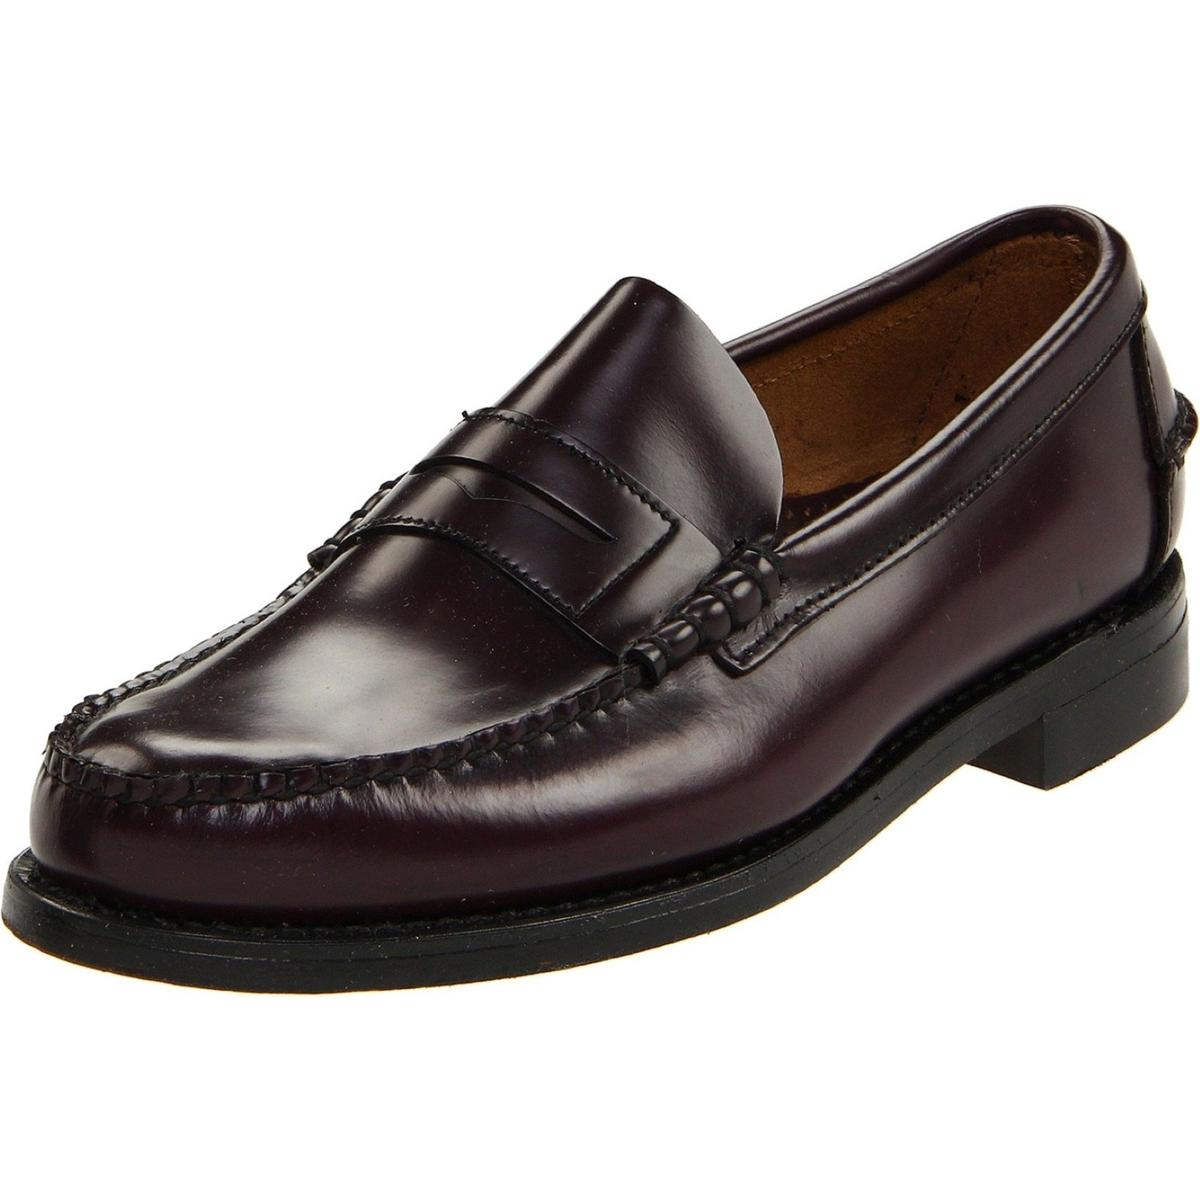 Sebago Men's Classic Cordo Leather Loafers by Sebago